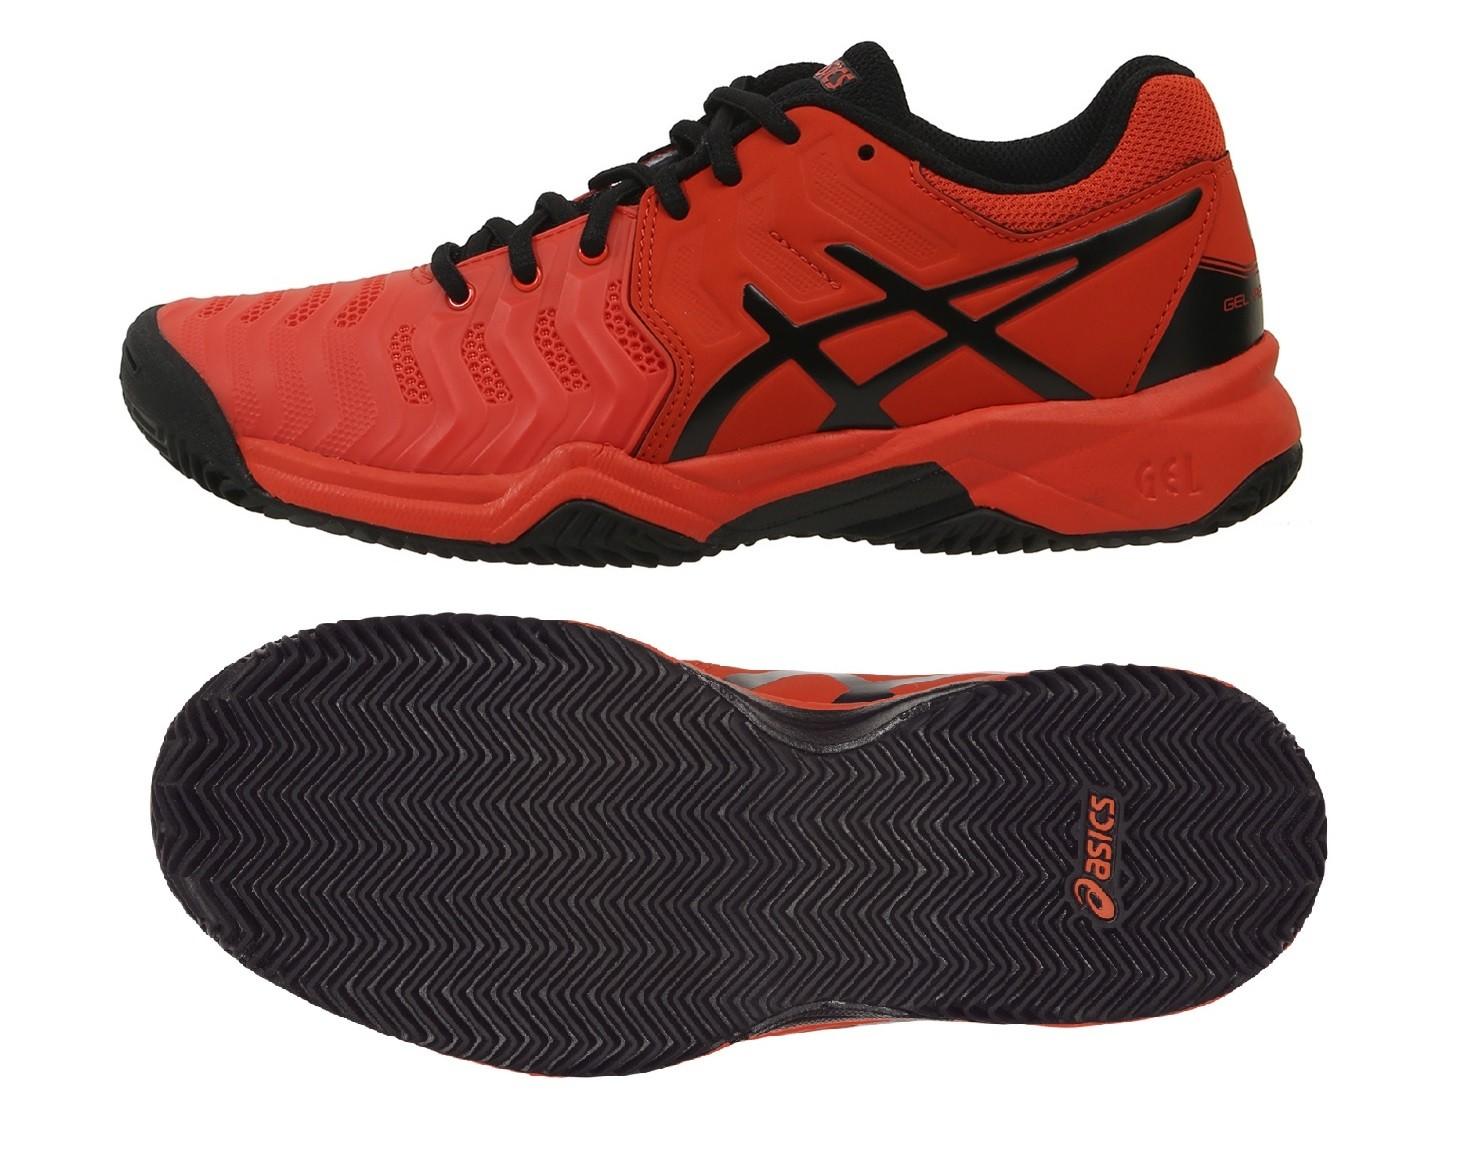 Dětská tenisová obuv Asics Gel Resolution 7 Clay GS C800Y-801 65260a5a69